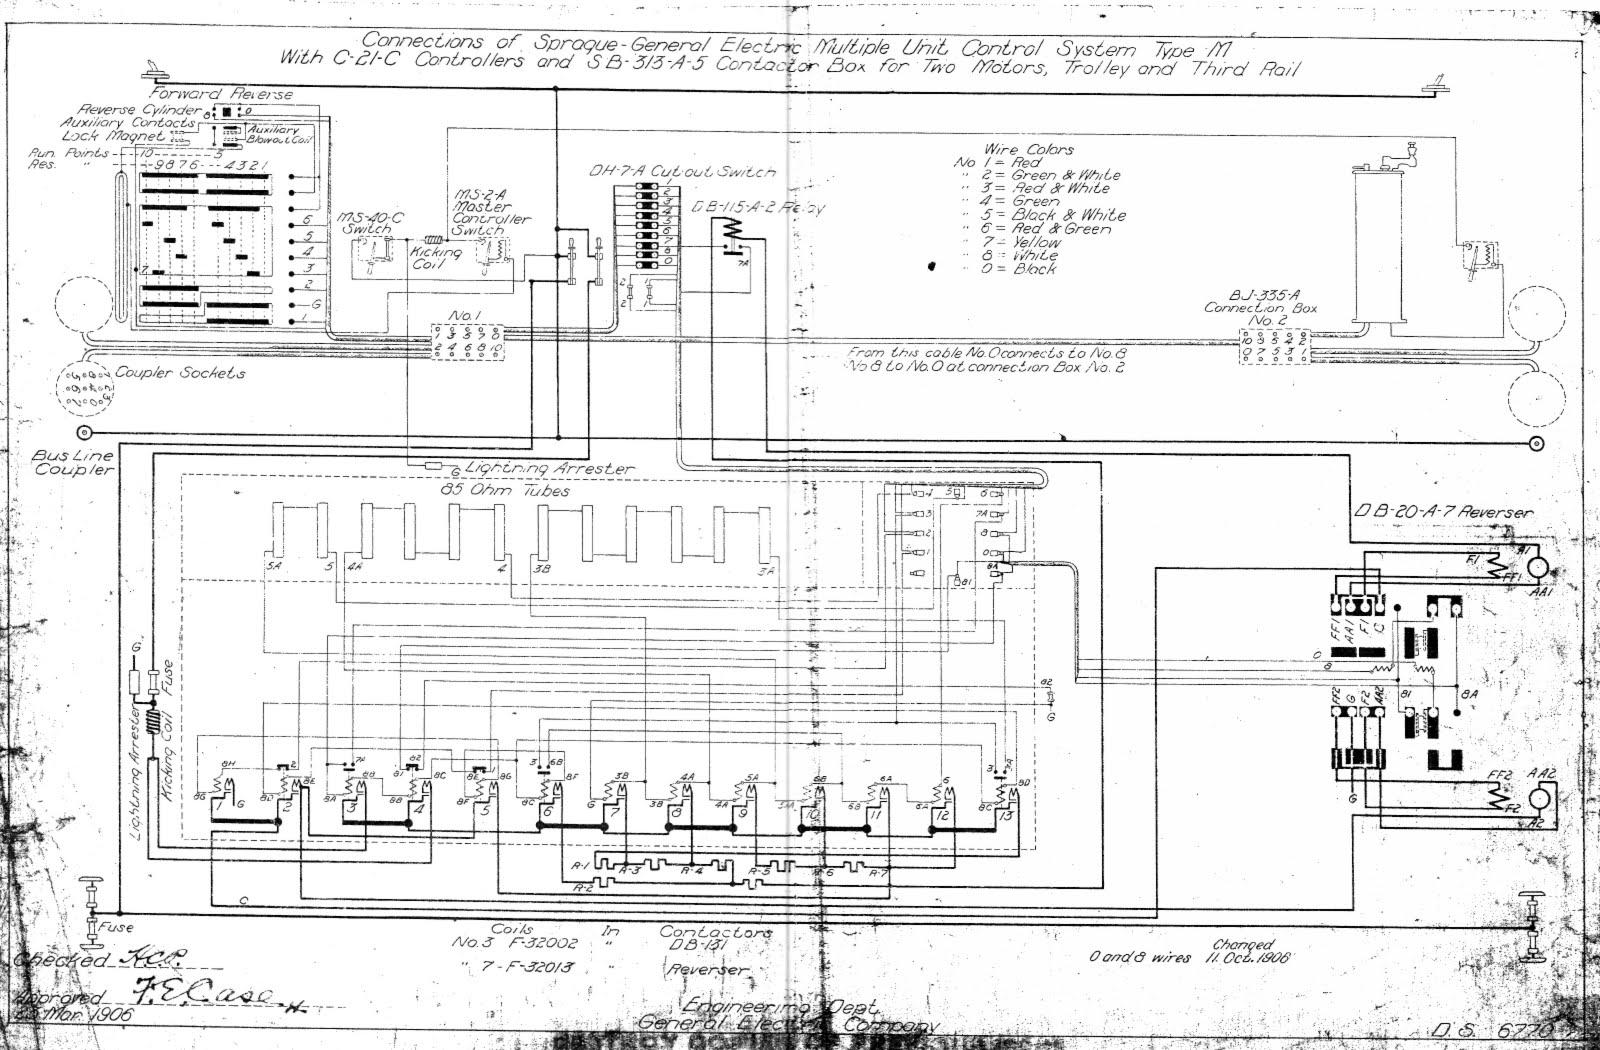 1984 dodge 318 ignition wiring diagram wiring library diagram on dodge durango engine diagram likewise ram 1500 wiring [ 1600 x 1050 Pixel ]